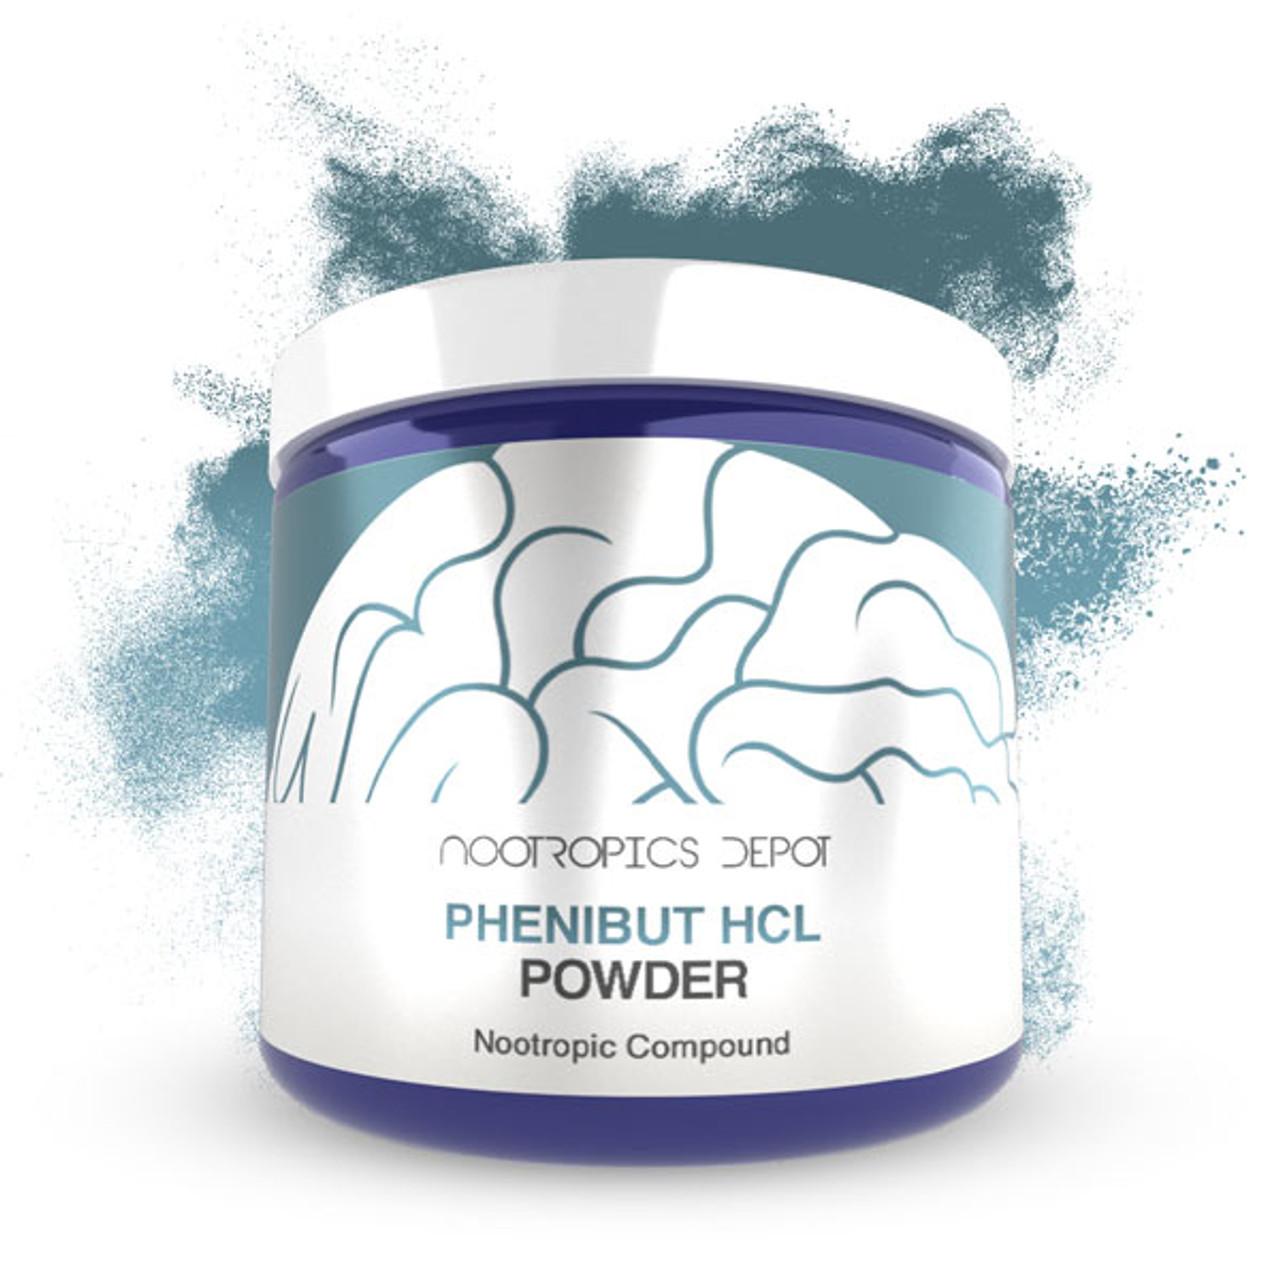 Phenibut HCL Powder